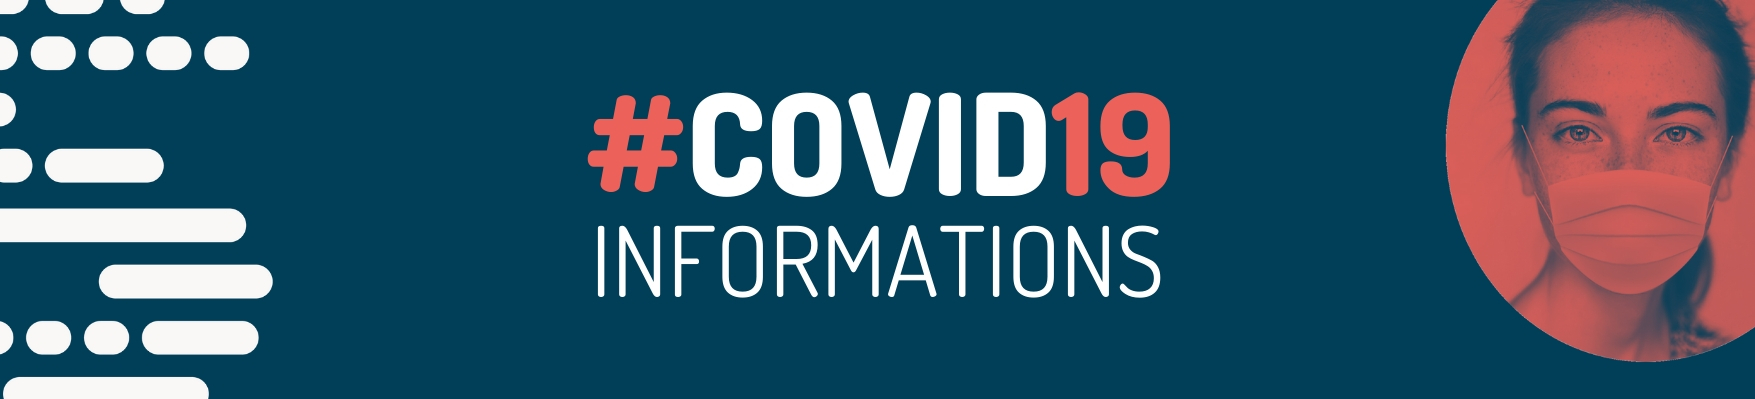 BANDEAU COVID INFORMATIONS EGERIE